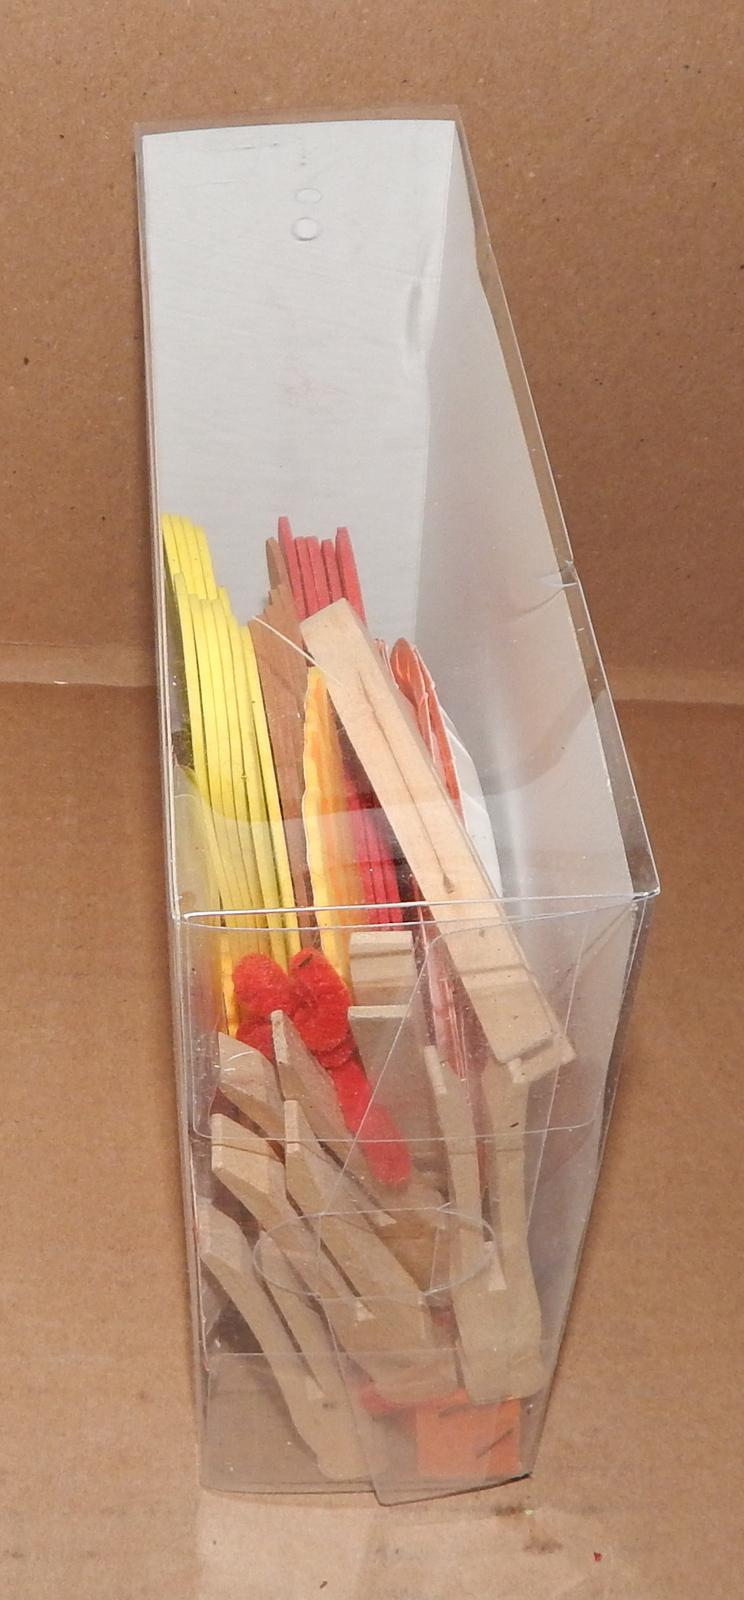 "Thanksgiving 3D Structure Foam Turkey Kids Craft Kit Makes6ea 55pc 7"" x 6"" 6+70W"